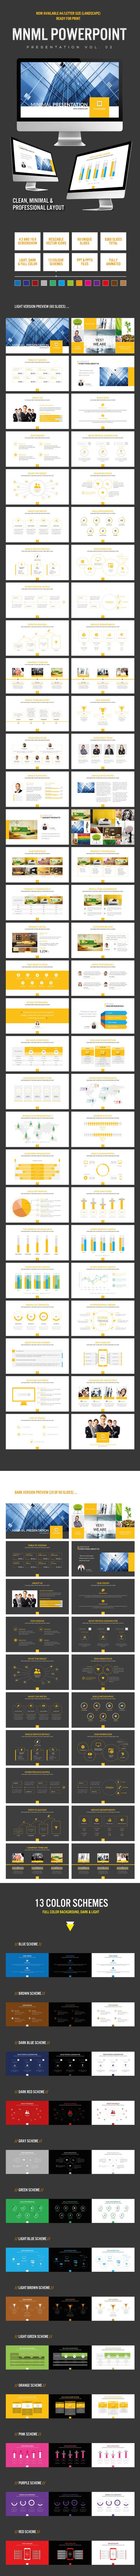 Multipurpose PowerPoint Presentation (Vol. 02) - PowerPoint Templates Presentation Templates